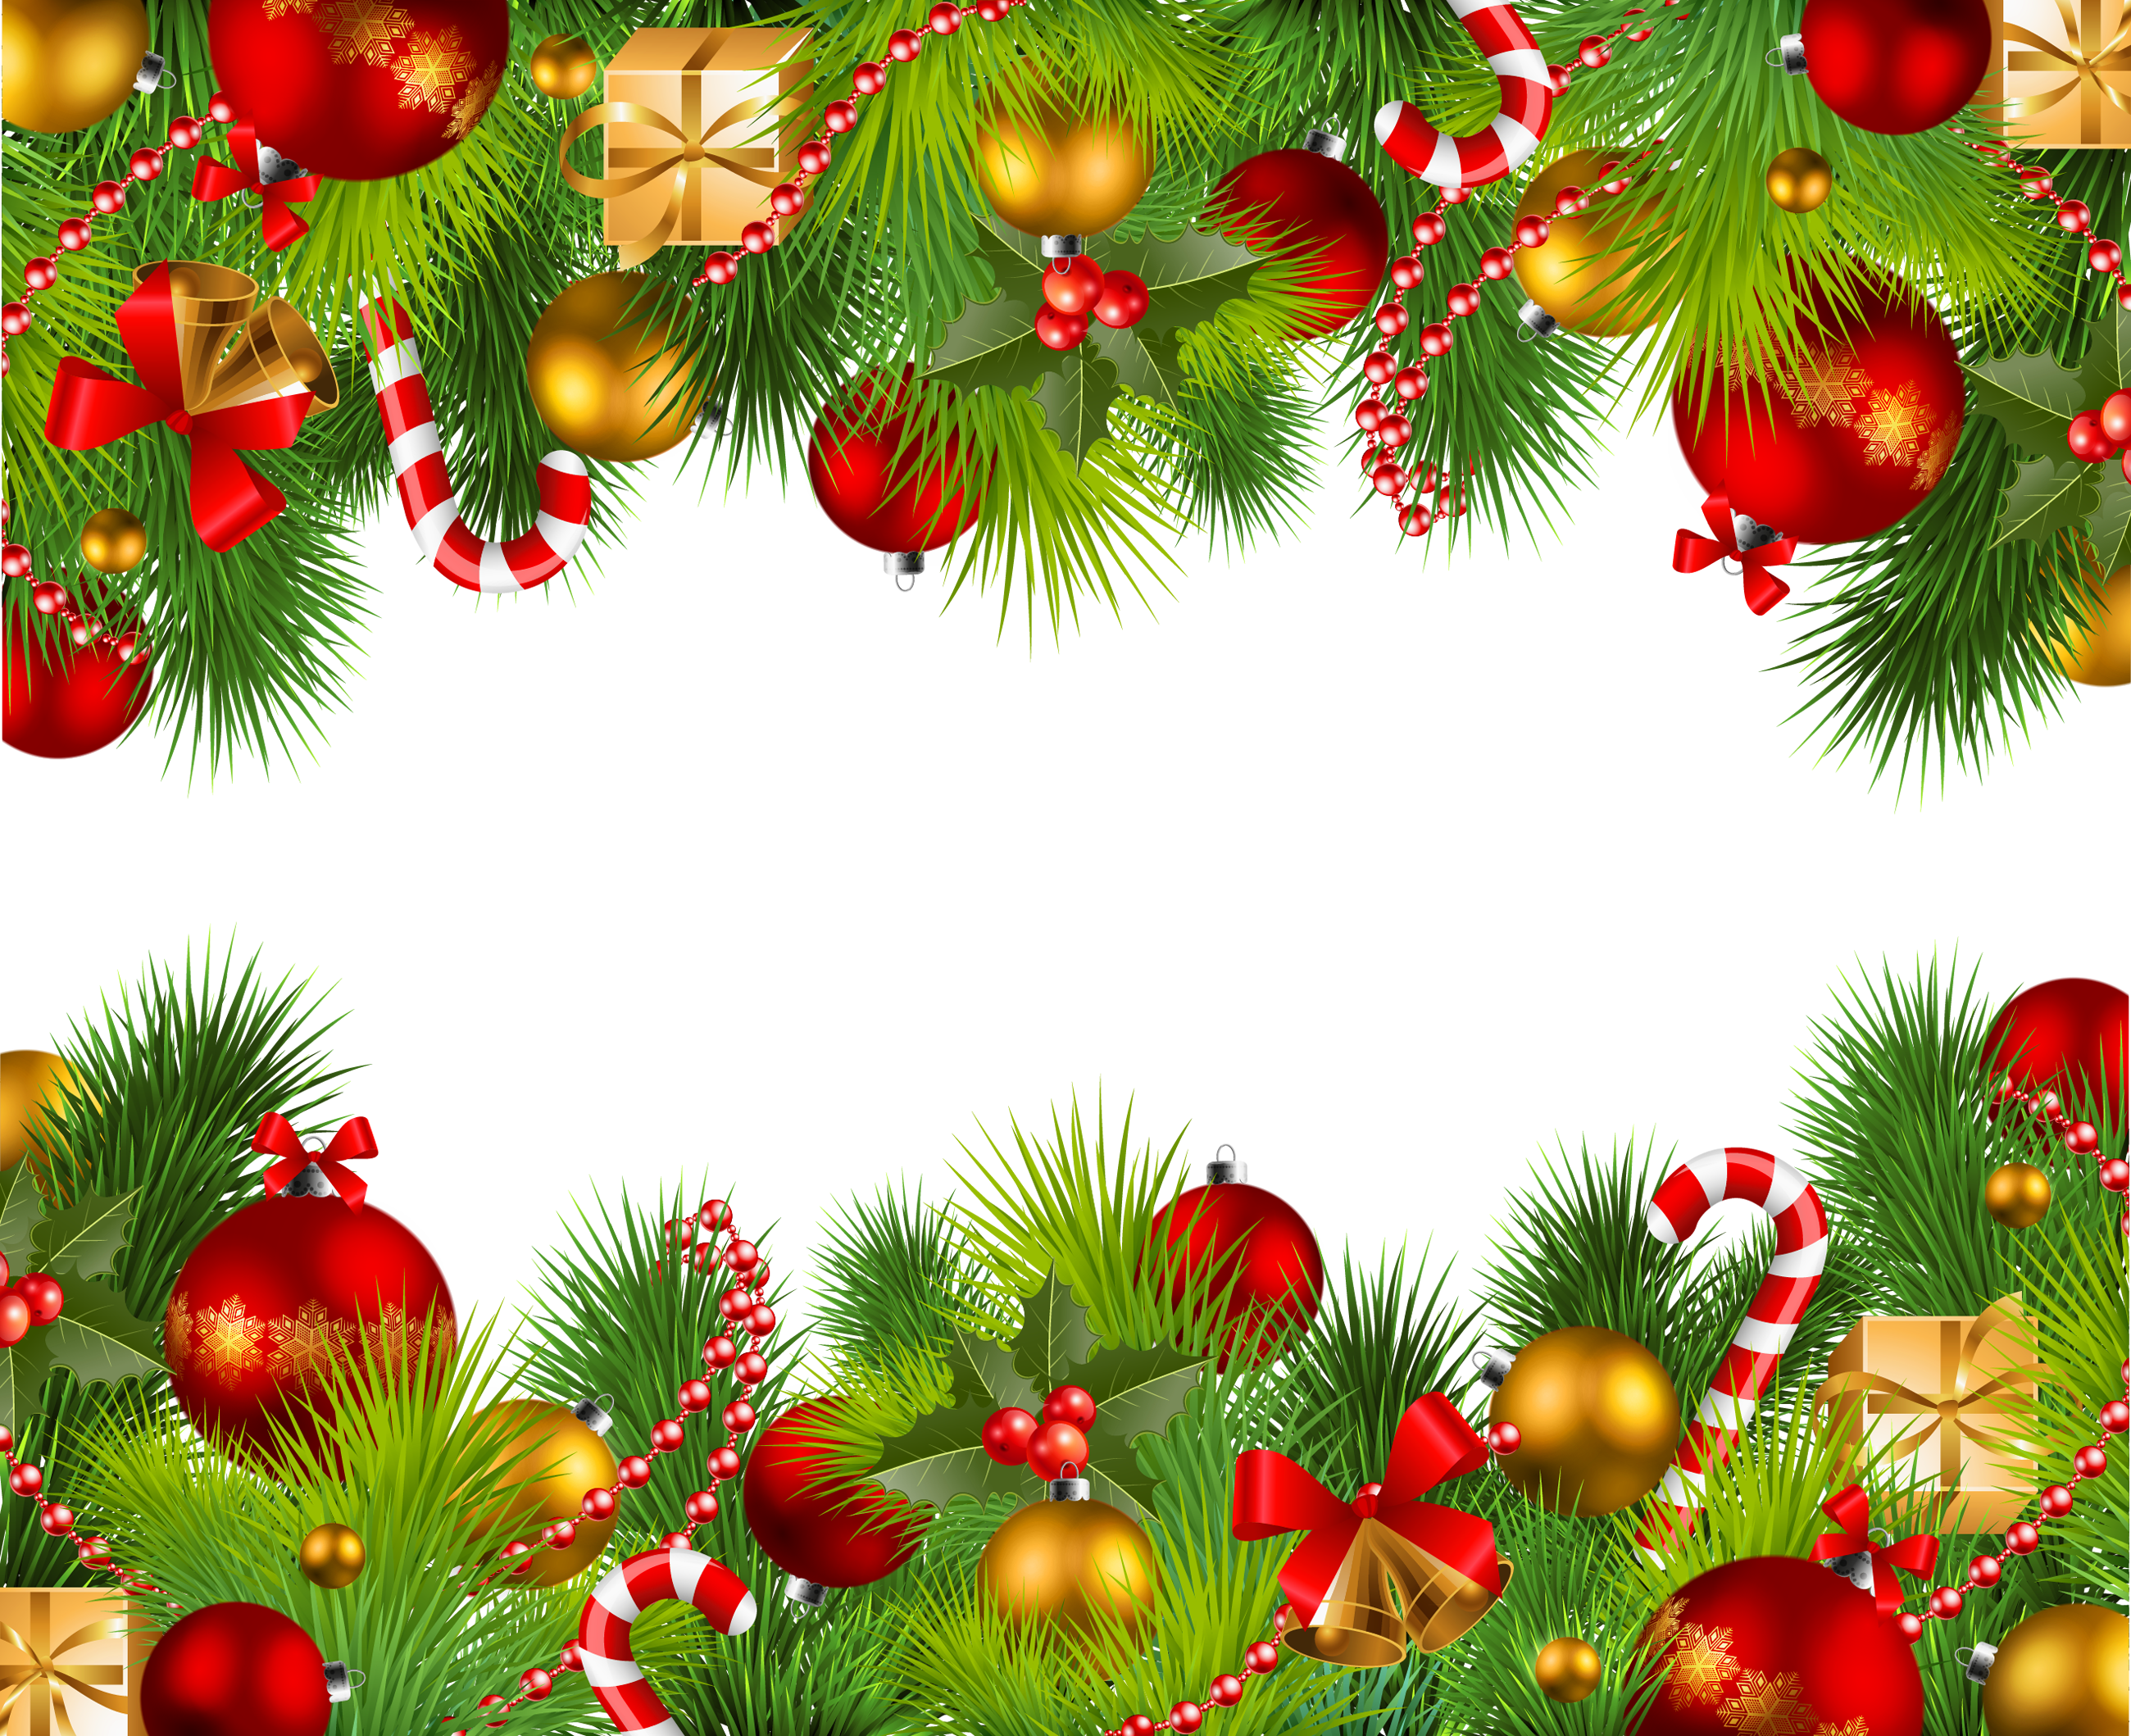 Christmas PNG images download Christmas photo frame